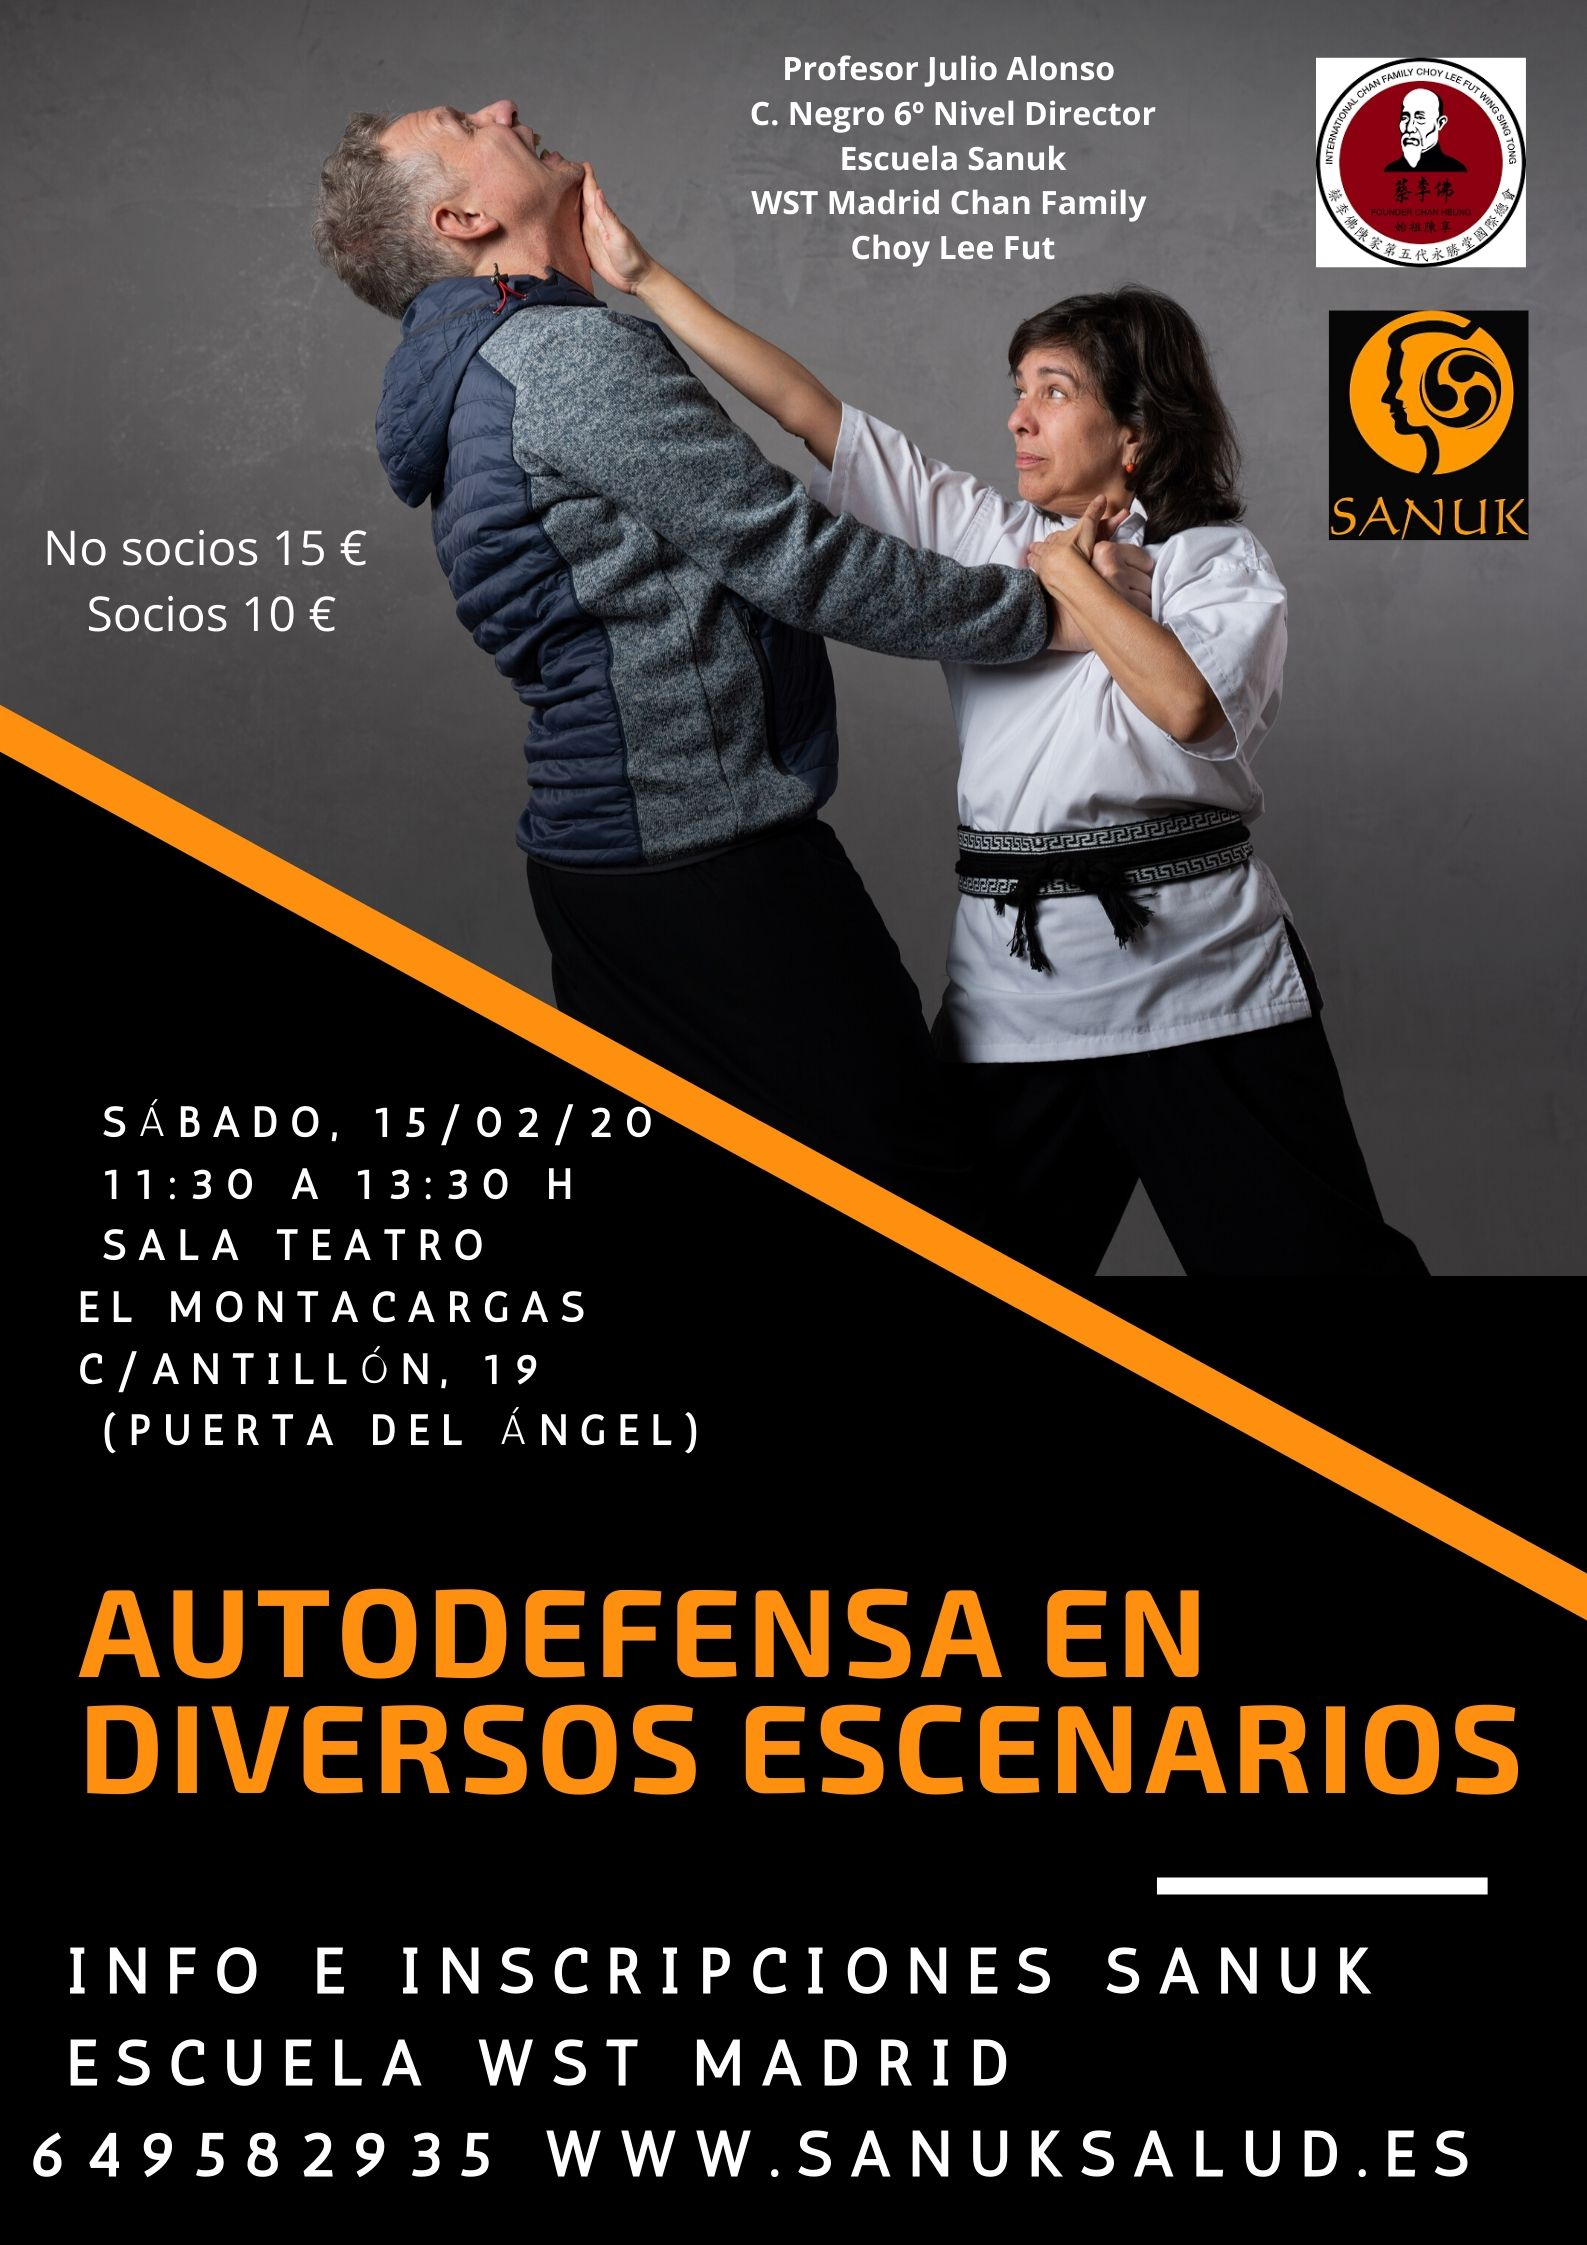 Autodefensa Kung Fu Sanuk Salud taller